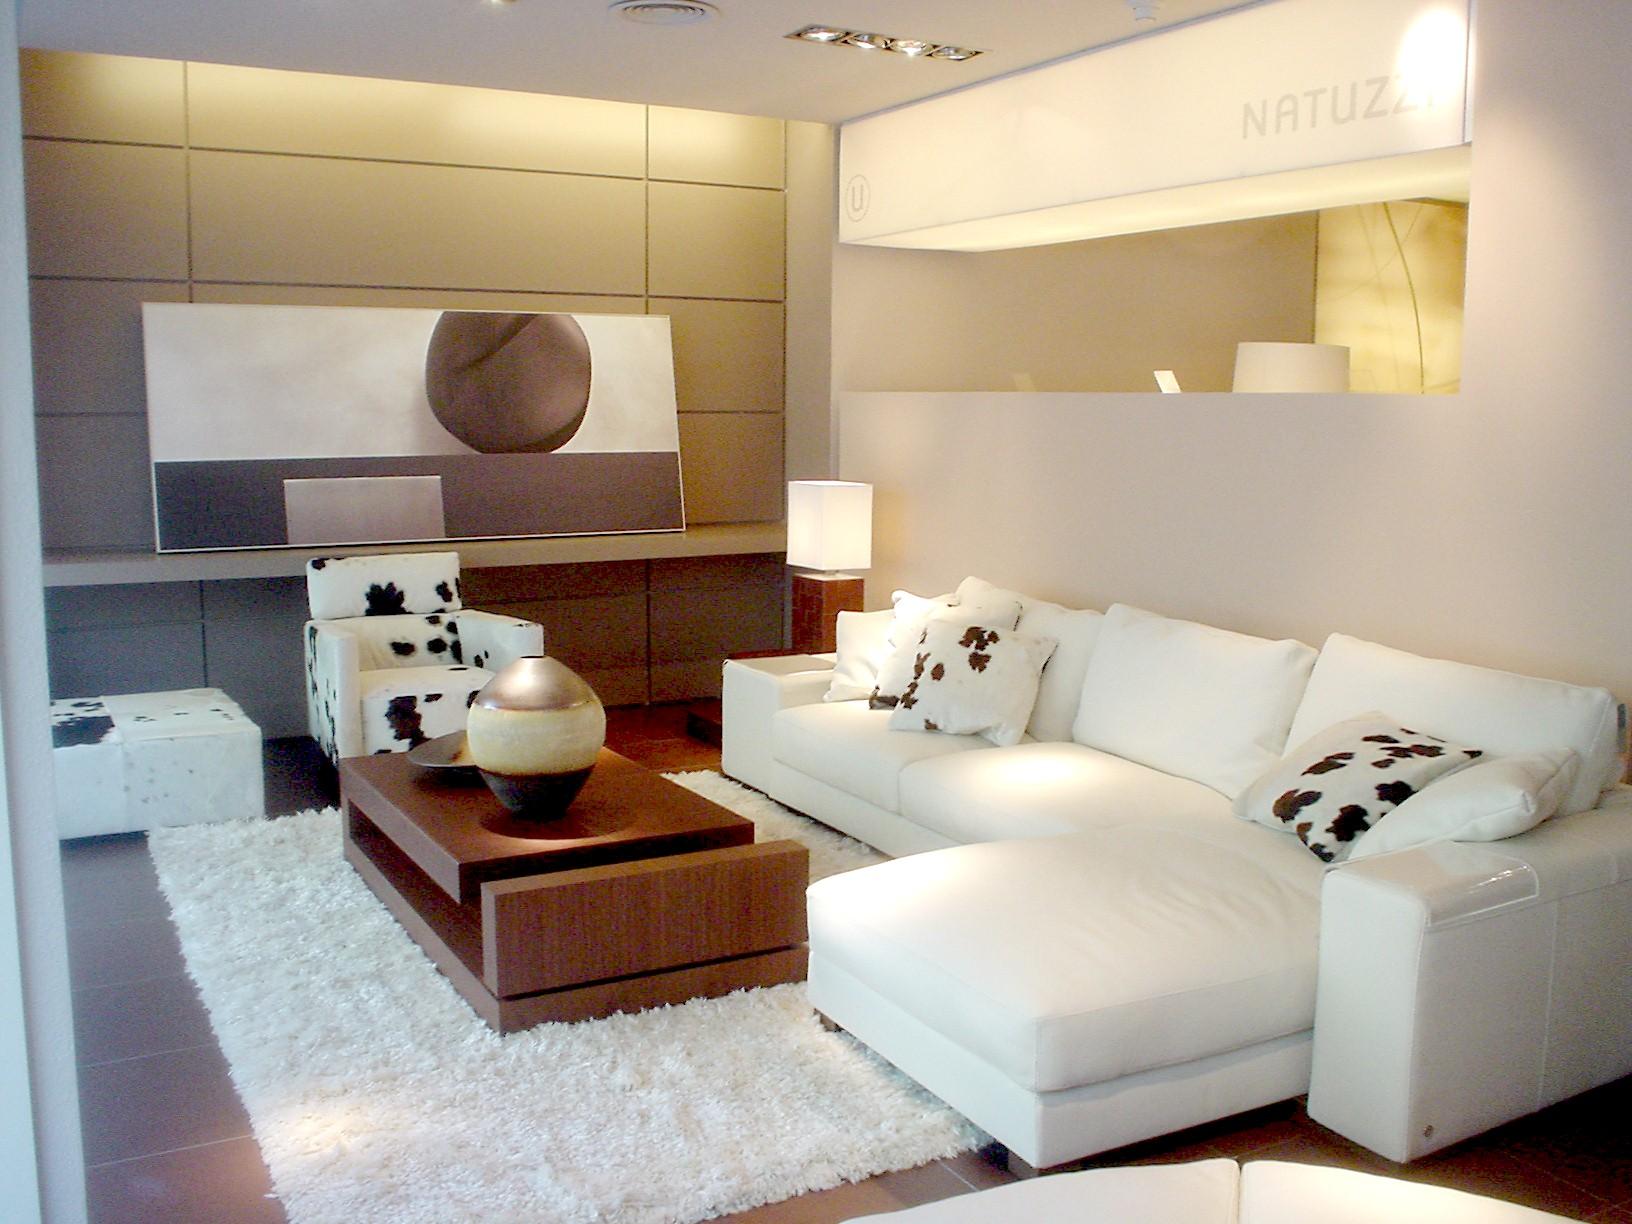 Interiors | Commerka - Investment Group